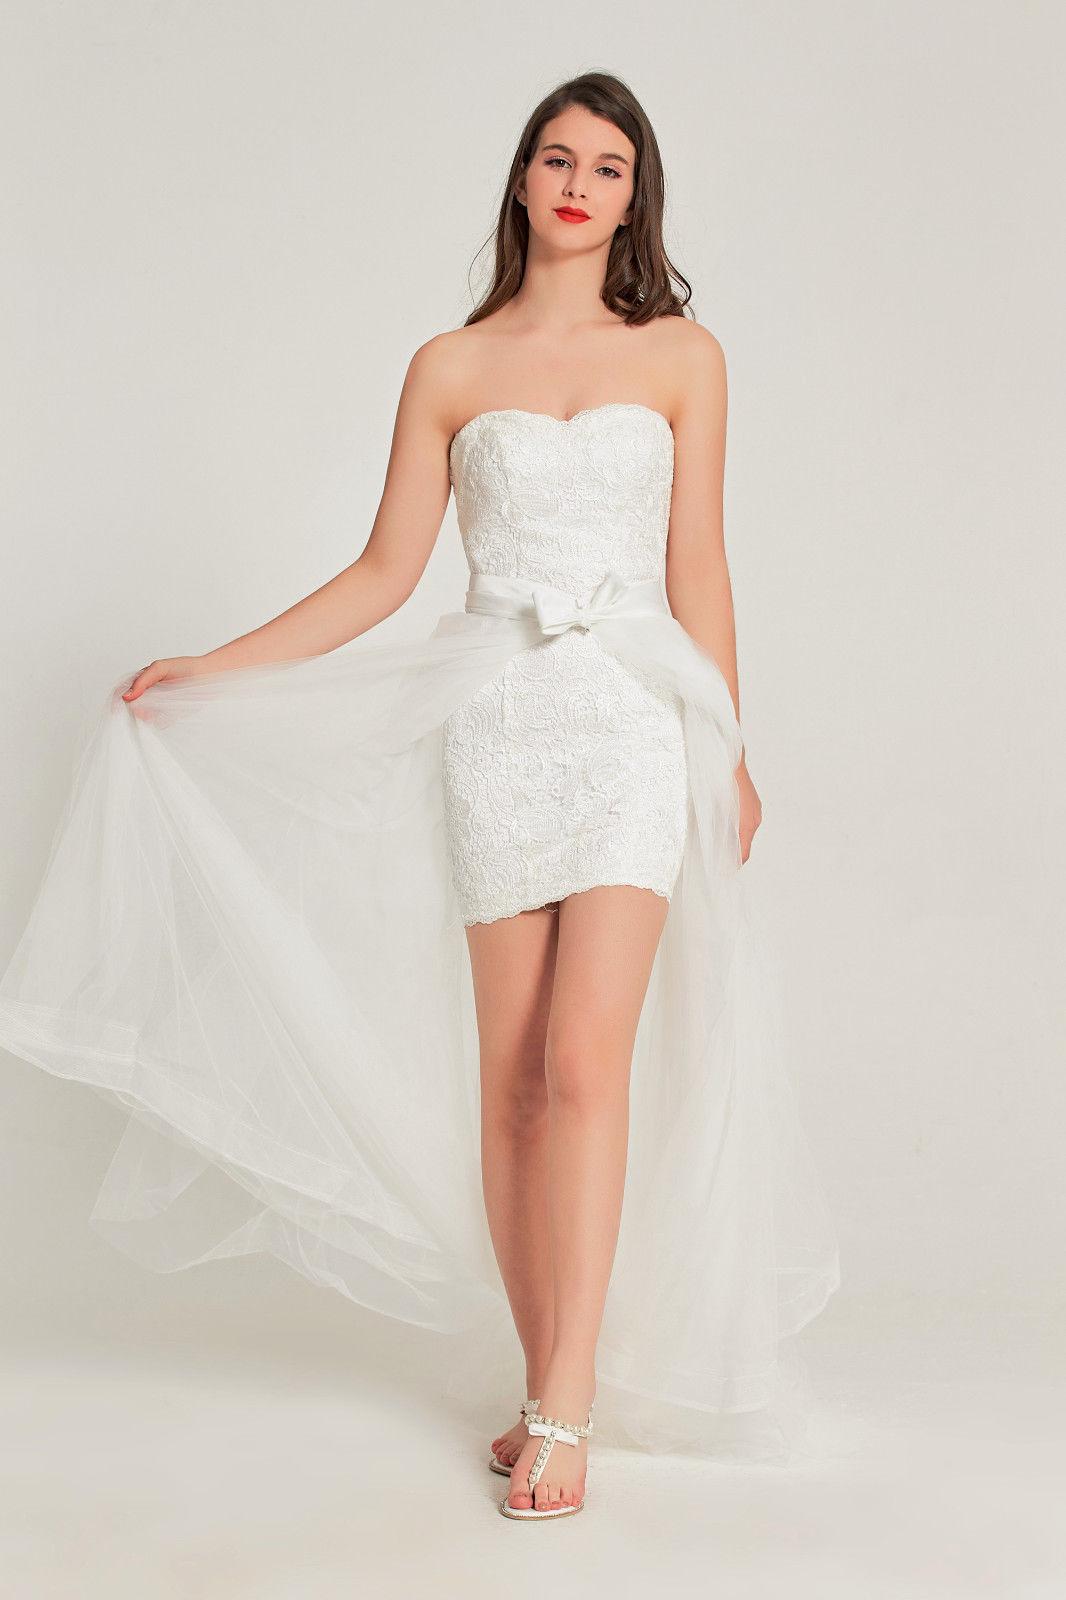 Shesole Womens Wedding Shoes Flat Gladiator Sandals Beach -9924